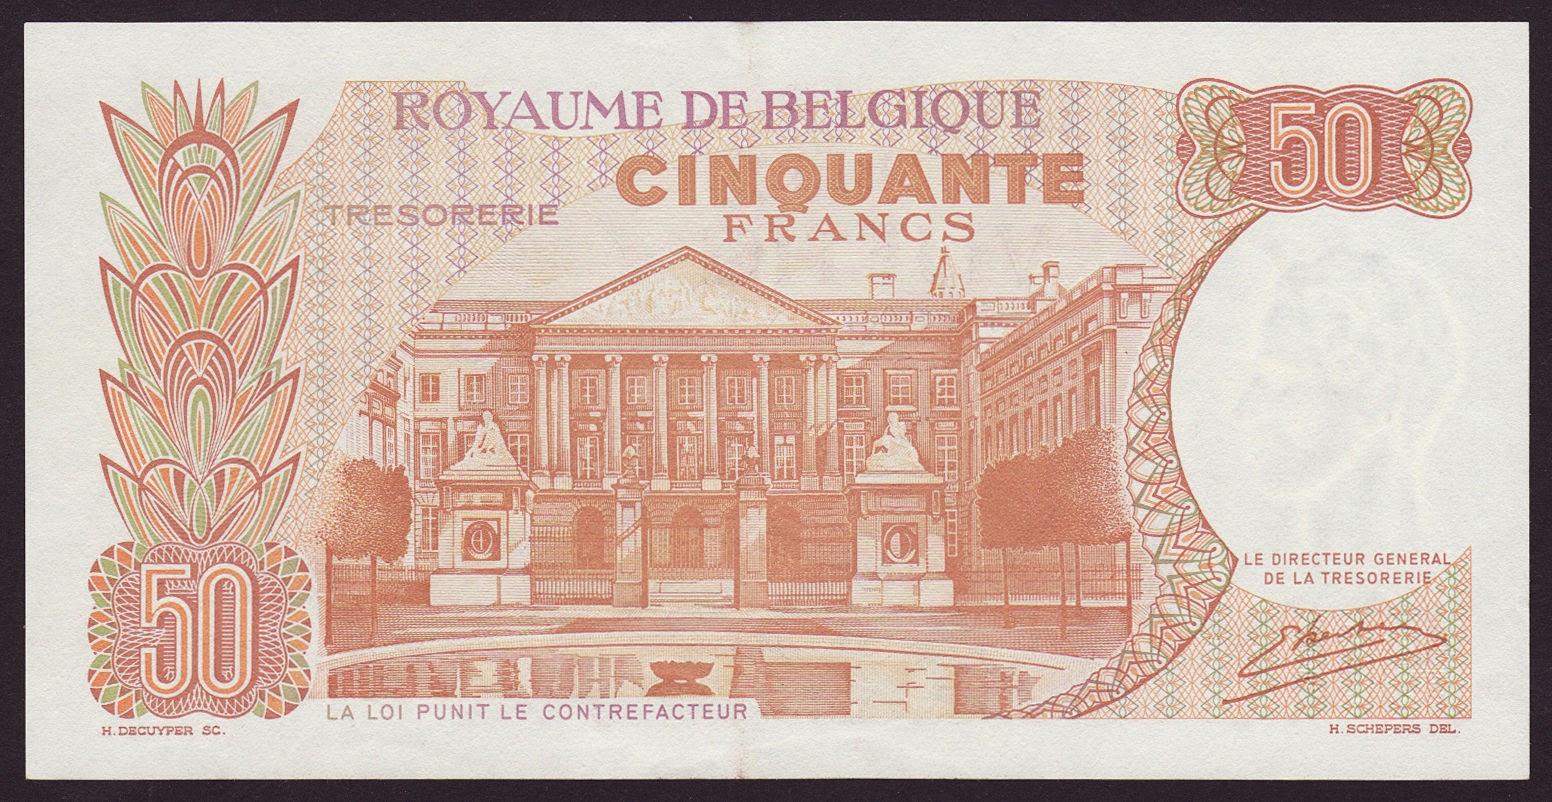 Belgium Banknotes 50 Francs Treasury Note 1966 Belgian Parliament Building in Brussels